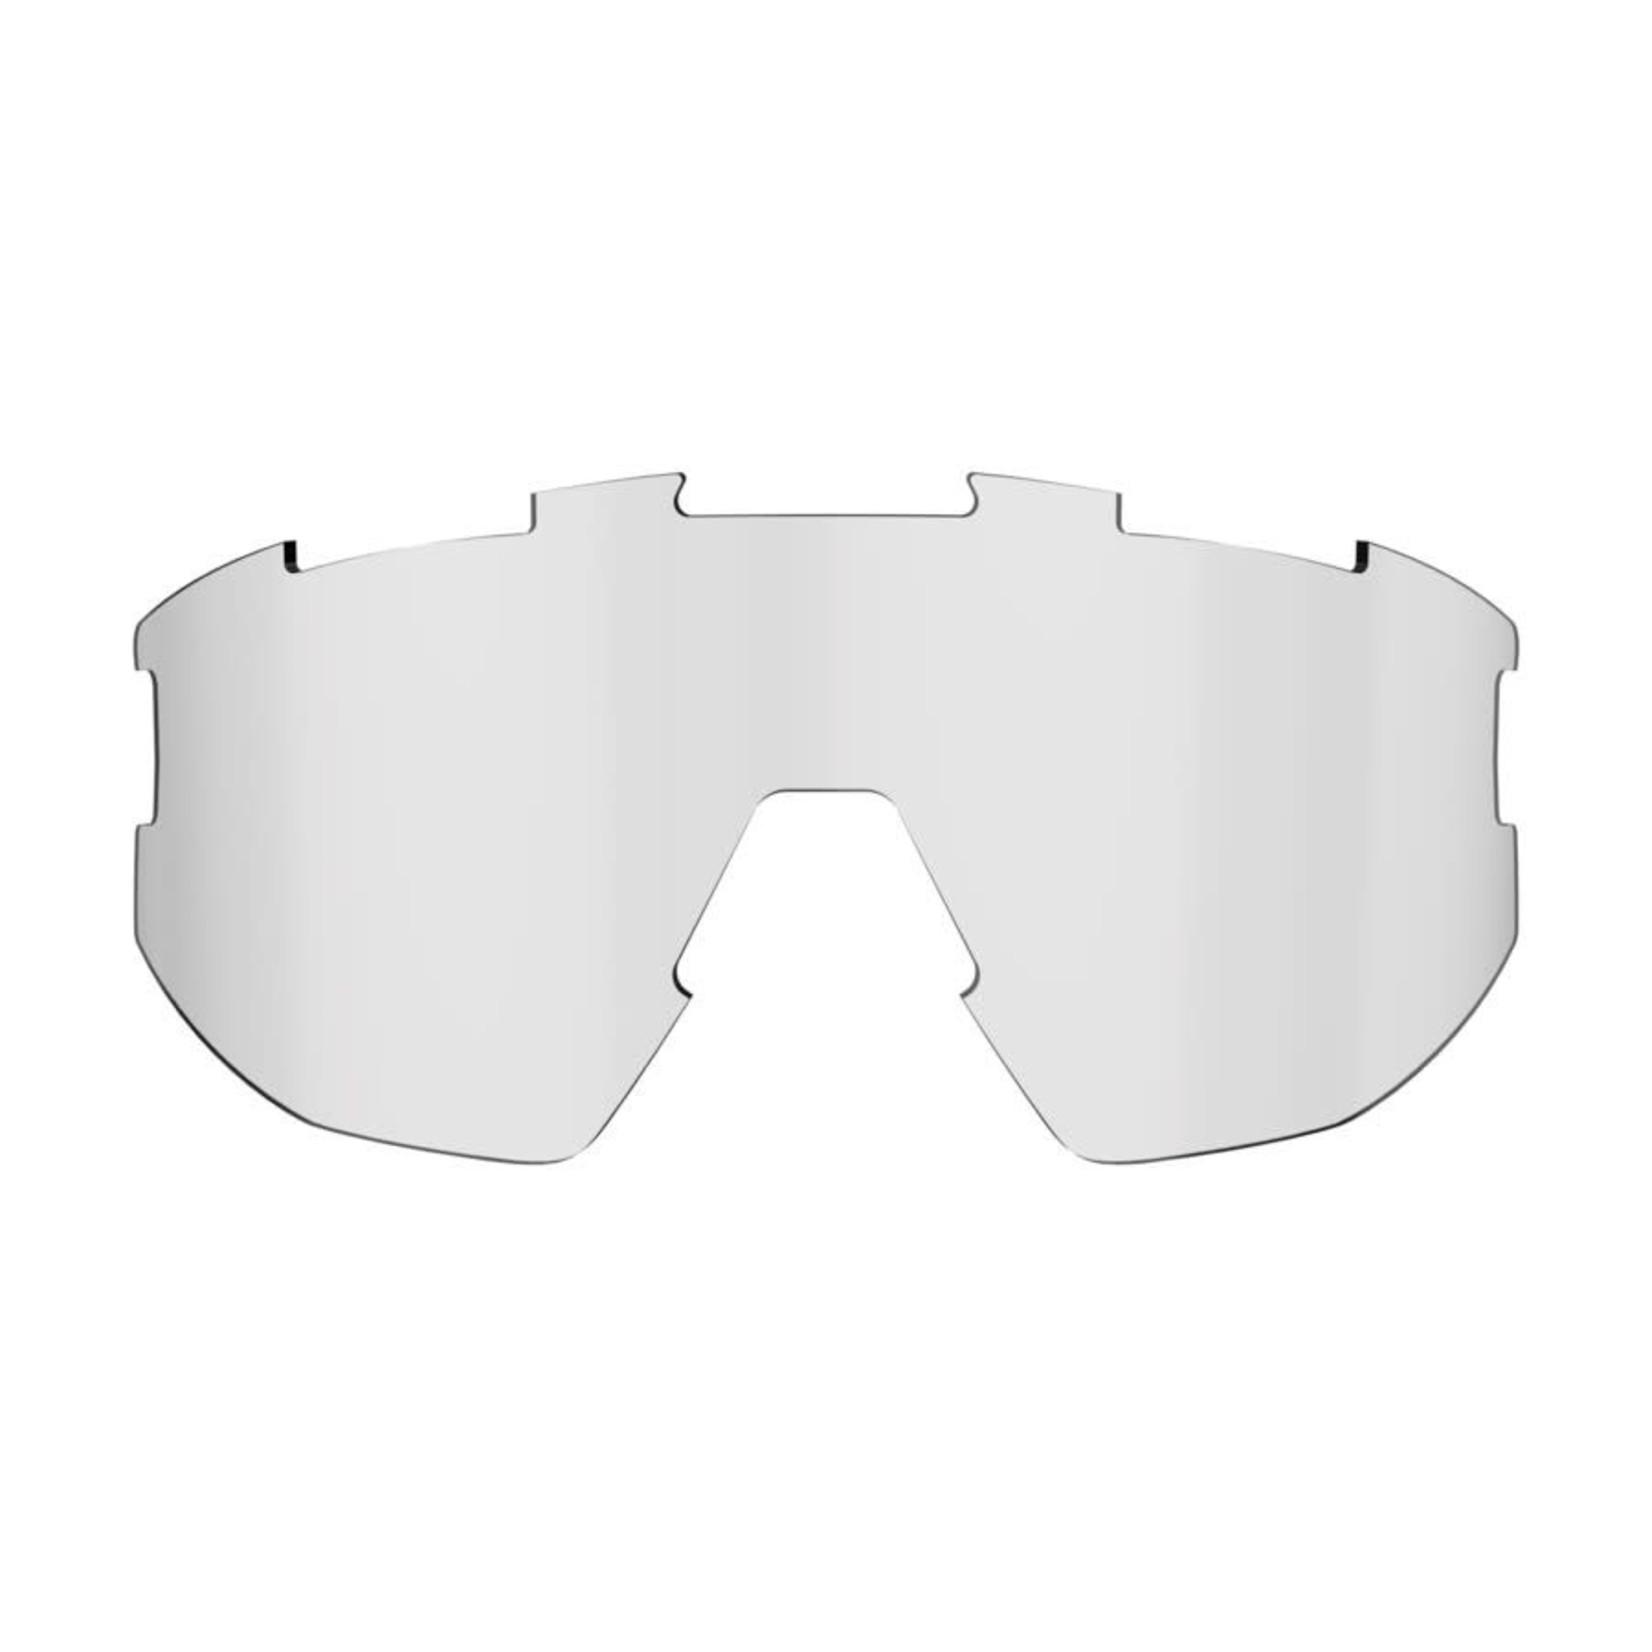 BLIZ FUSION / MATRIX Spare Lense - Clear